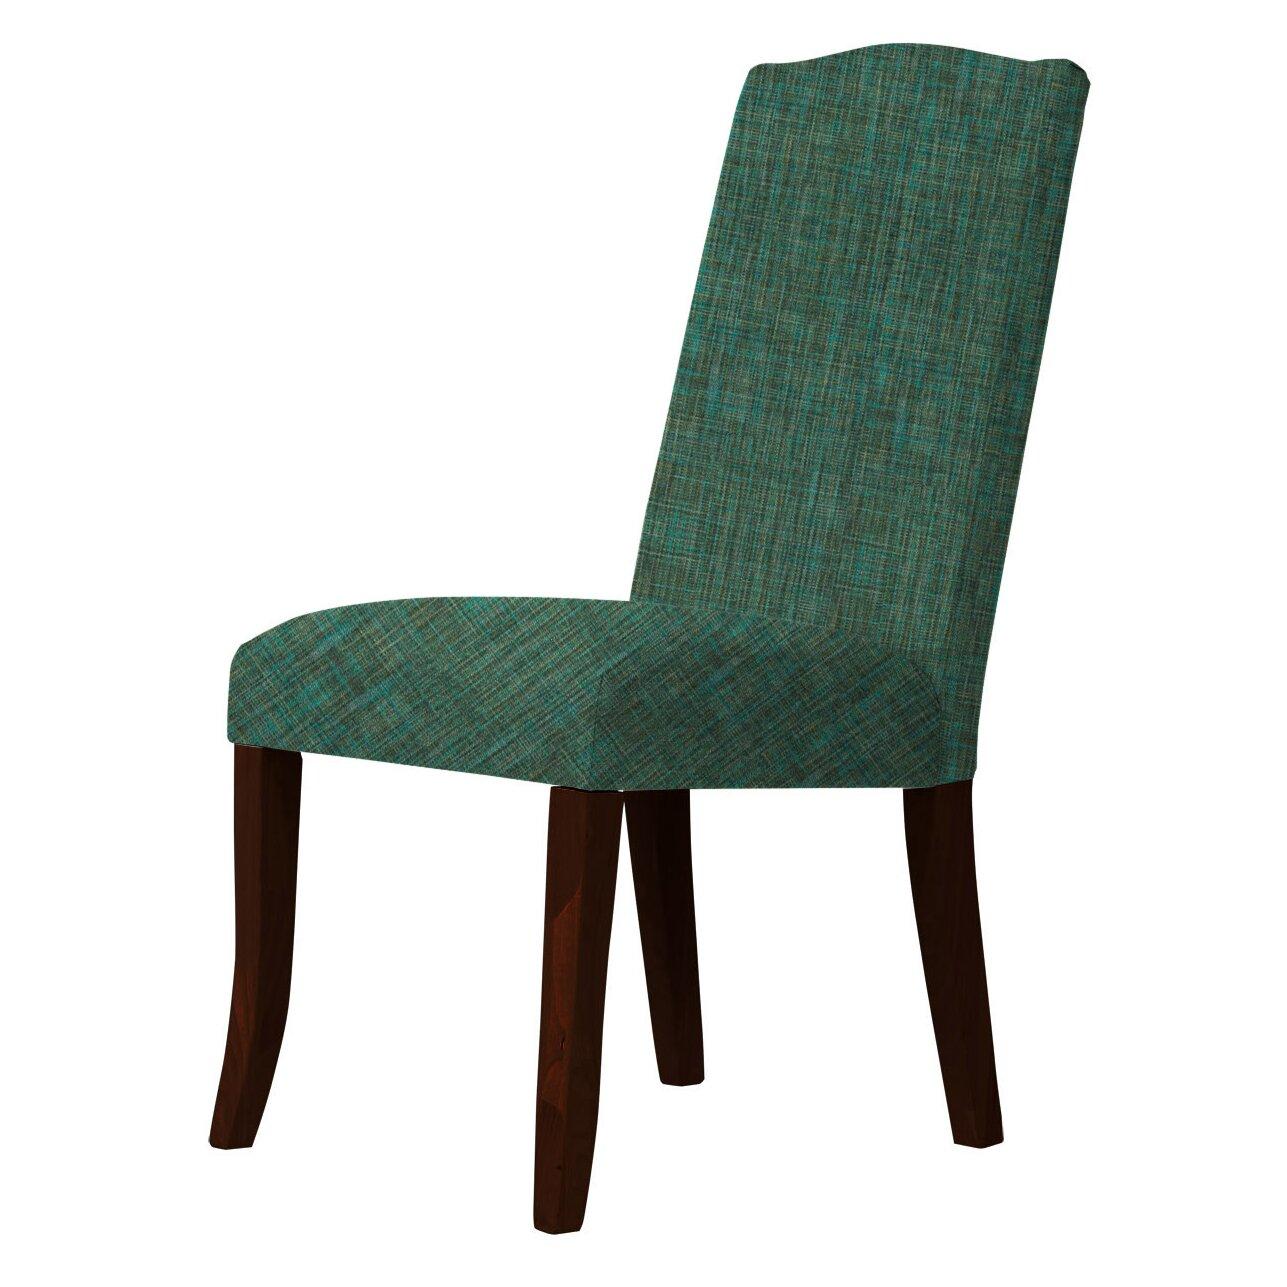 Red barrel studio lasseter upholstered dining chair for Red upholstered dining chair